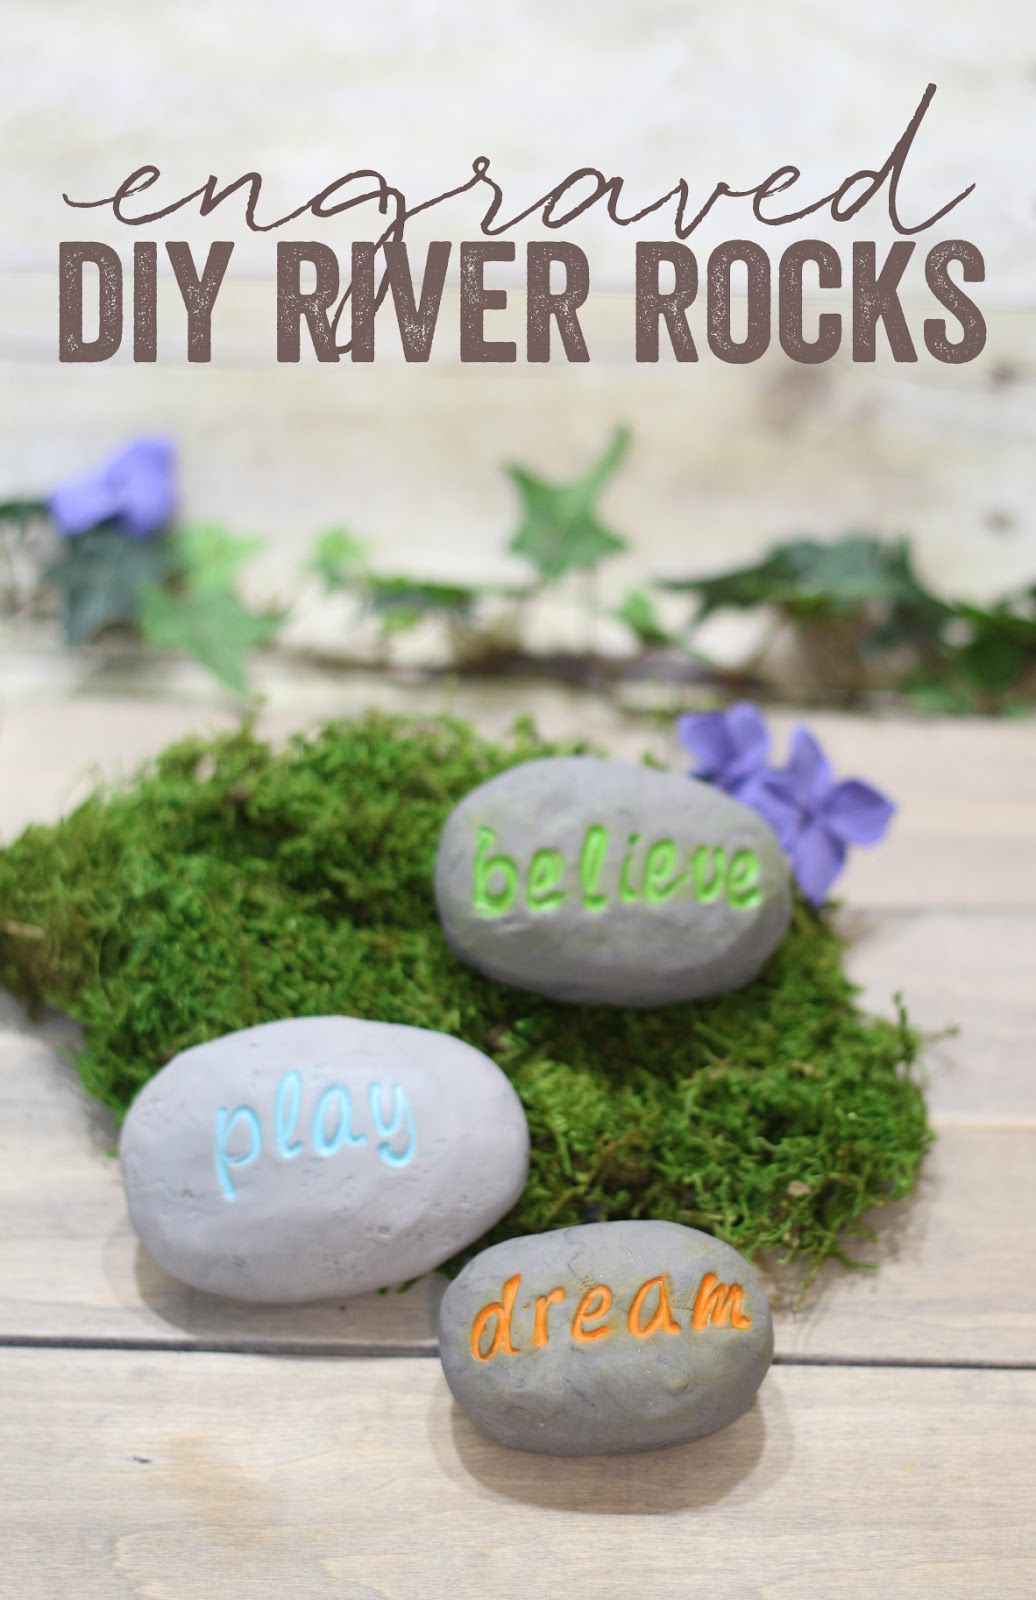 DIY engraved inspirational river rocks stones polymer clay